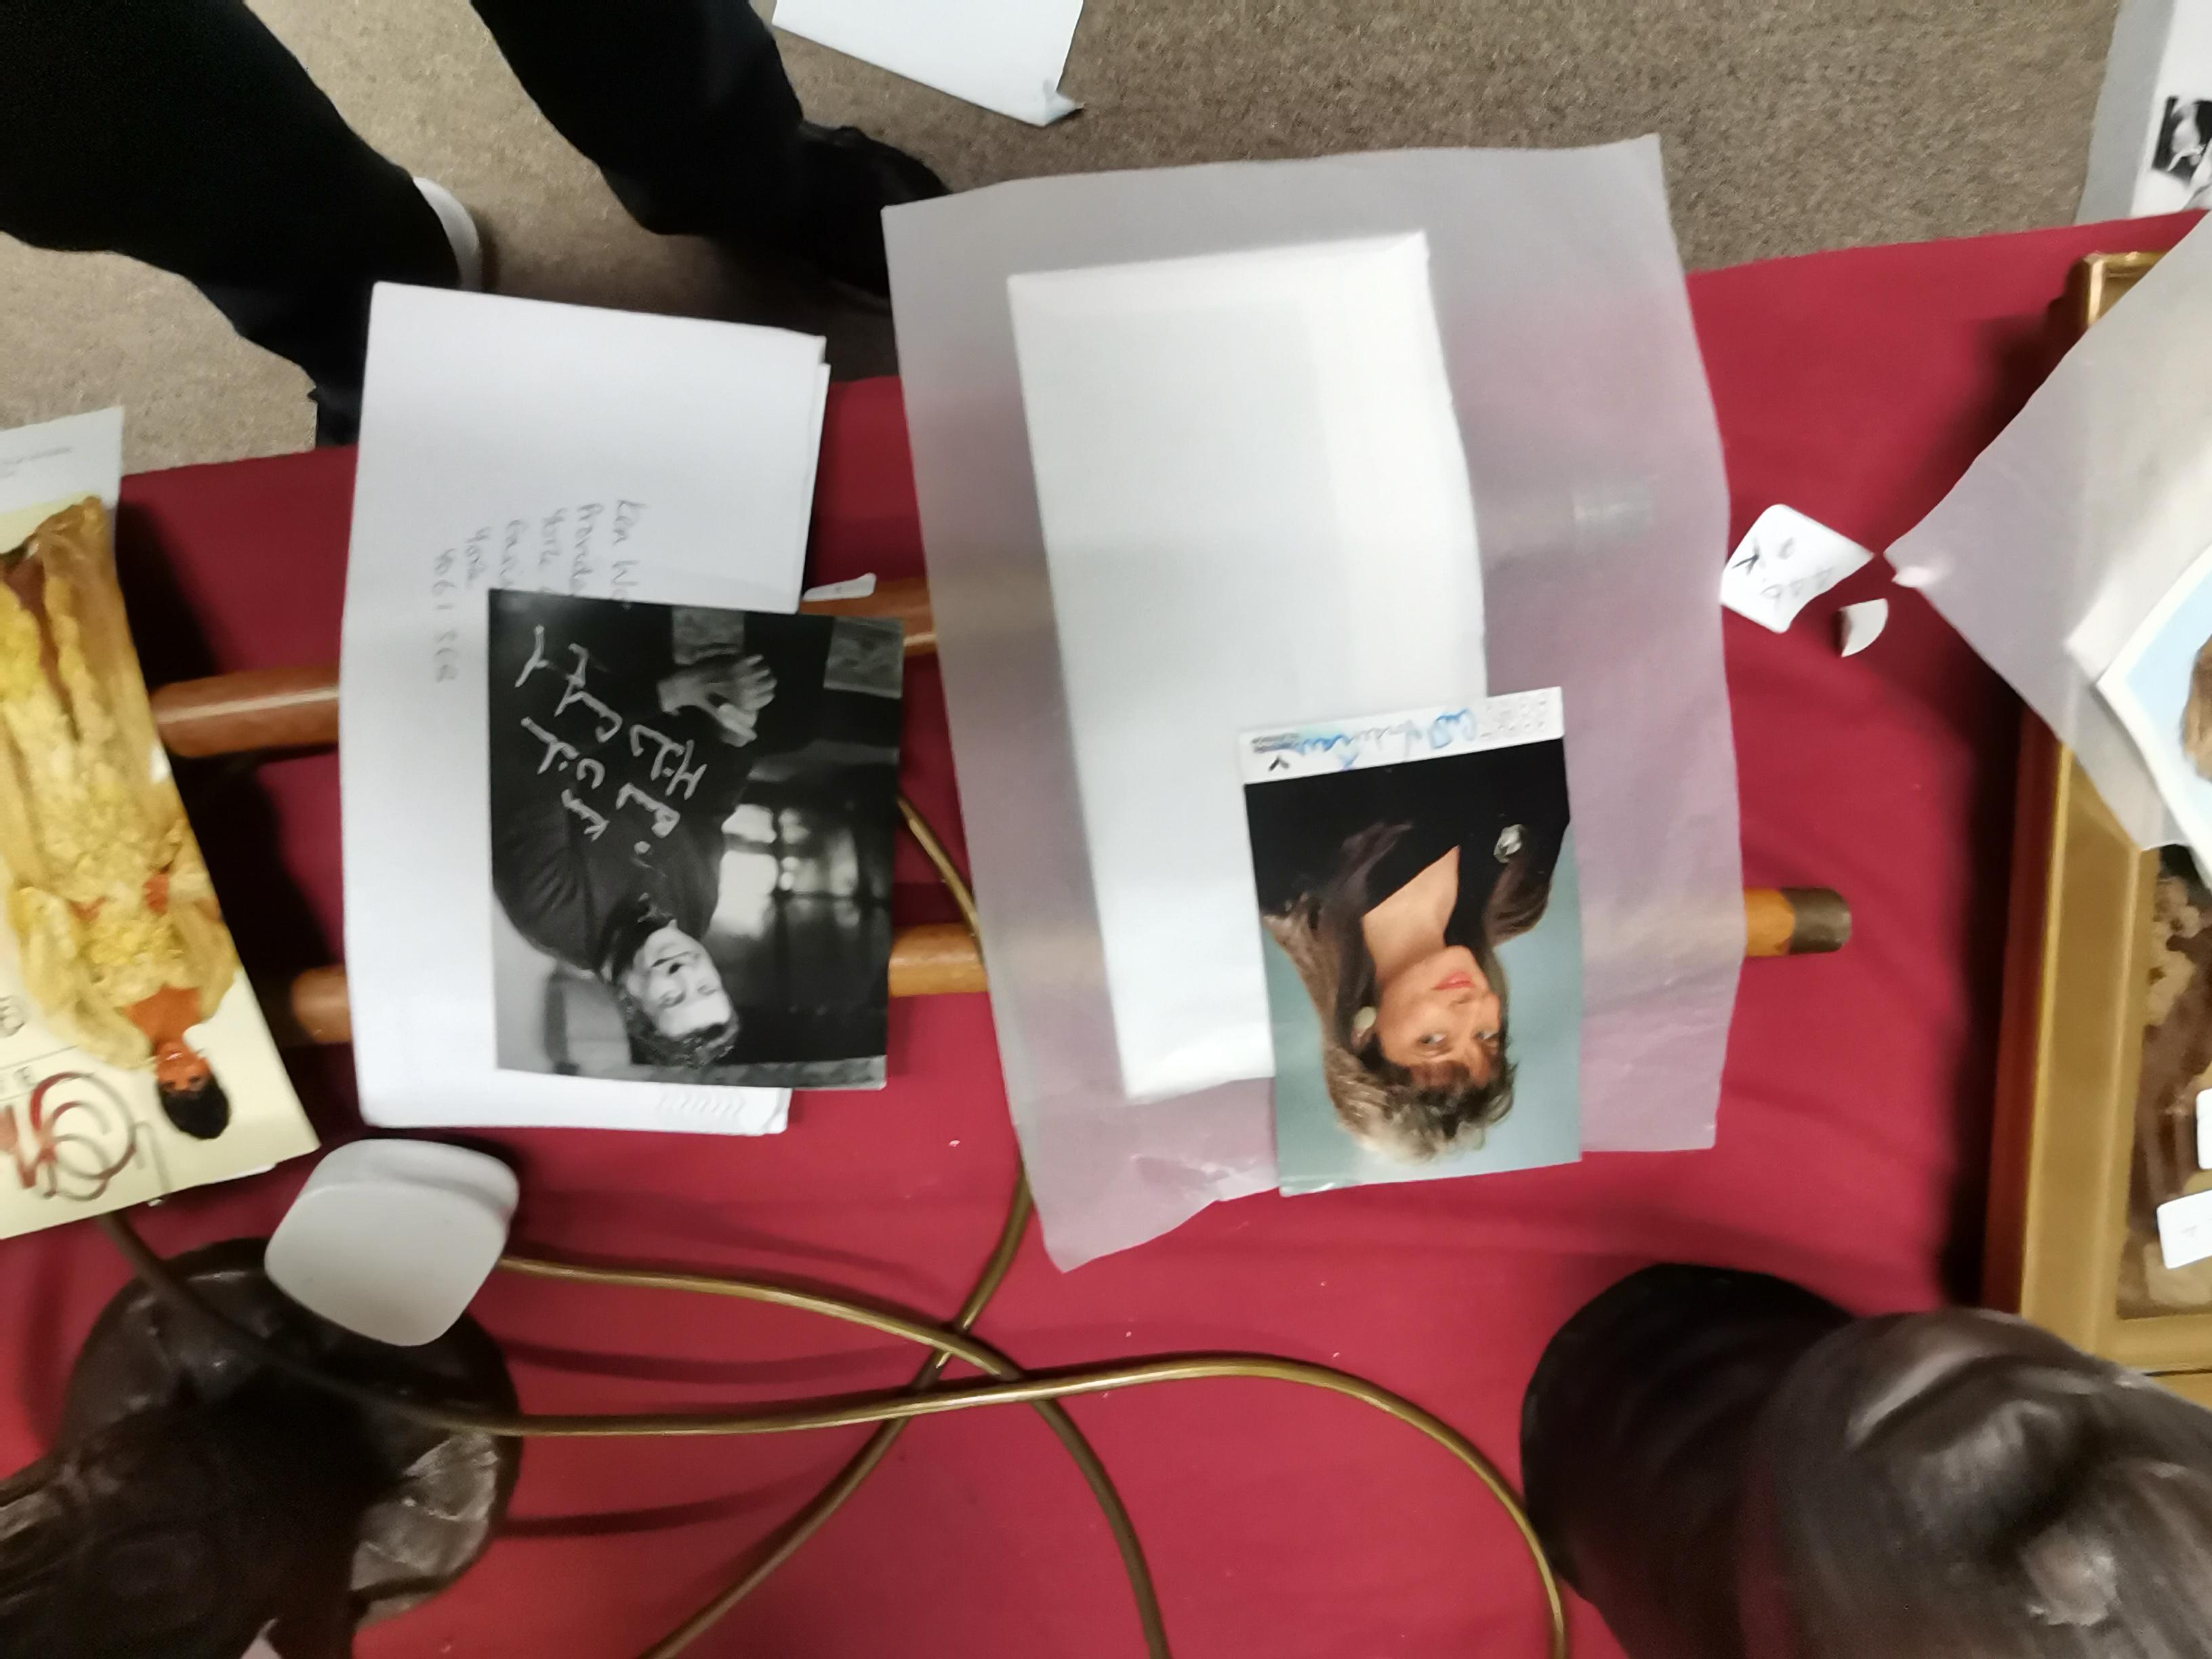 30 Plus Autographs In Folder - Image 6 of 7